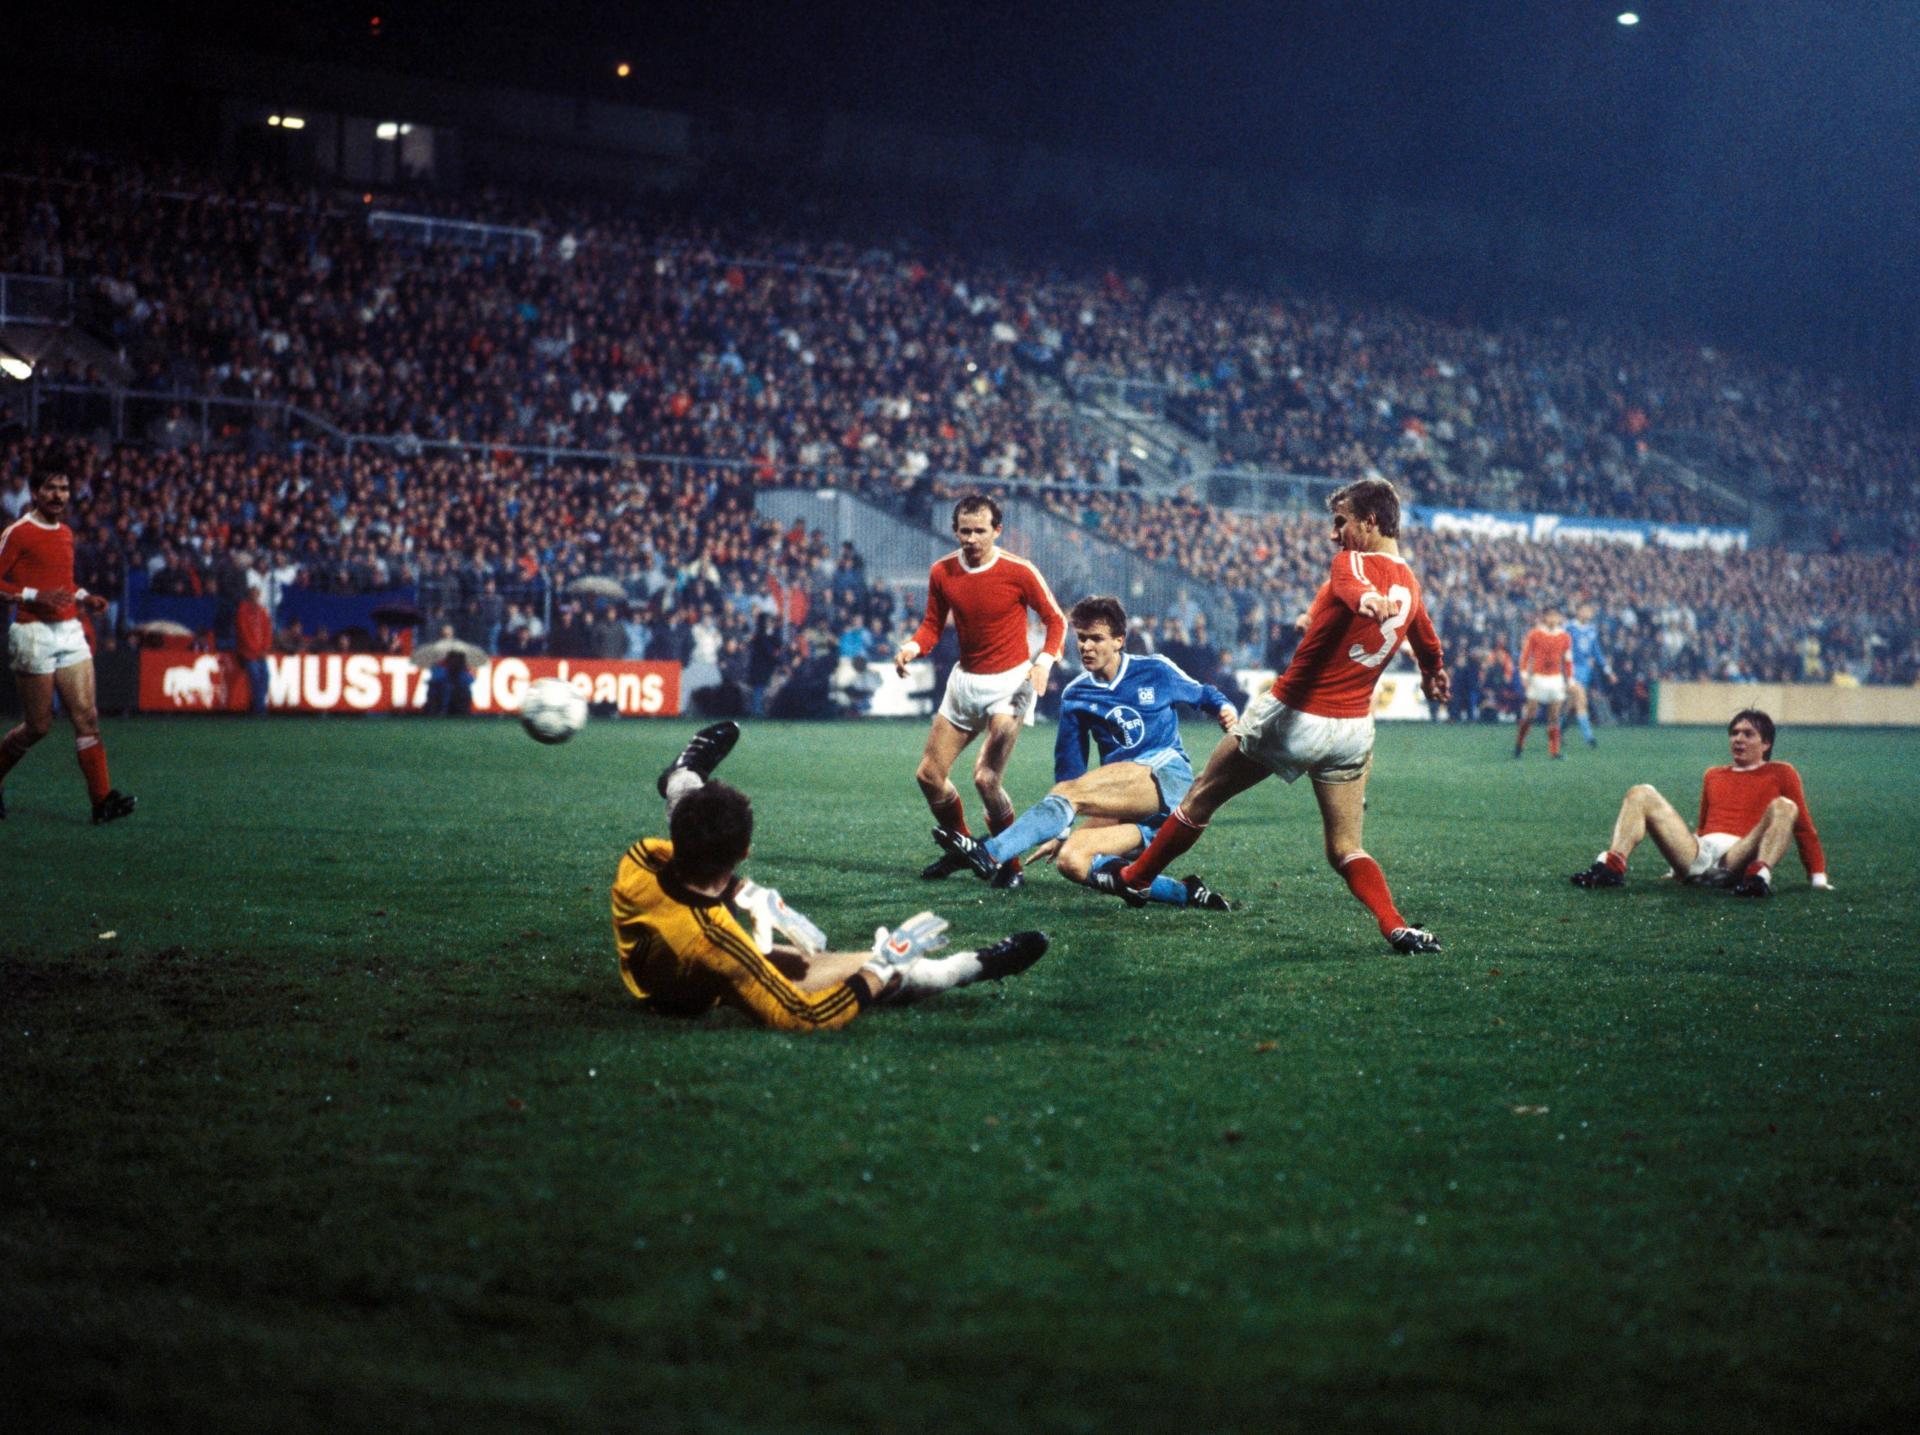 Bayer 05 Uerdingen - Widzew Łódź 2:0 (05.11.1986) Henryk Bolesta